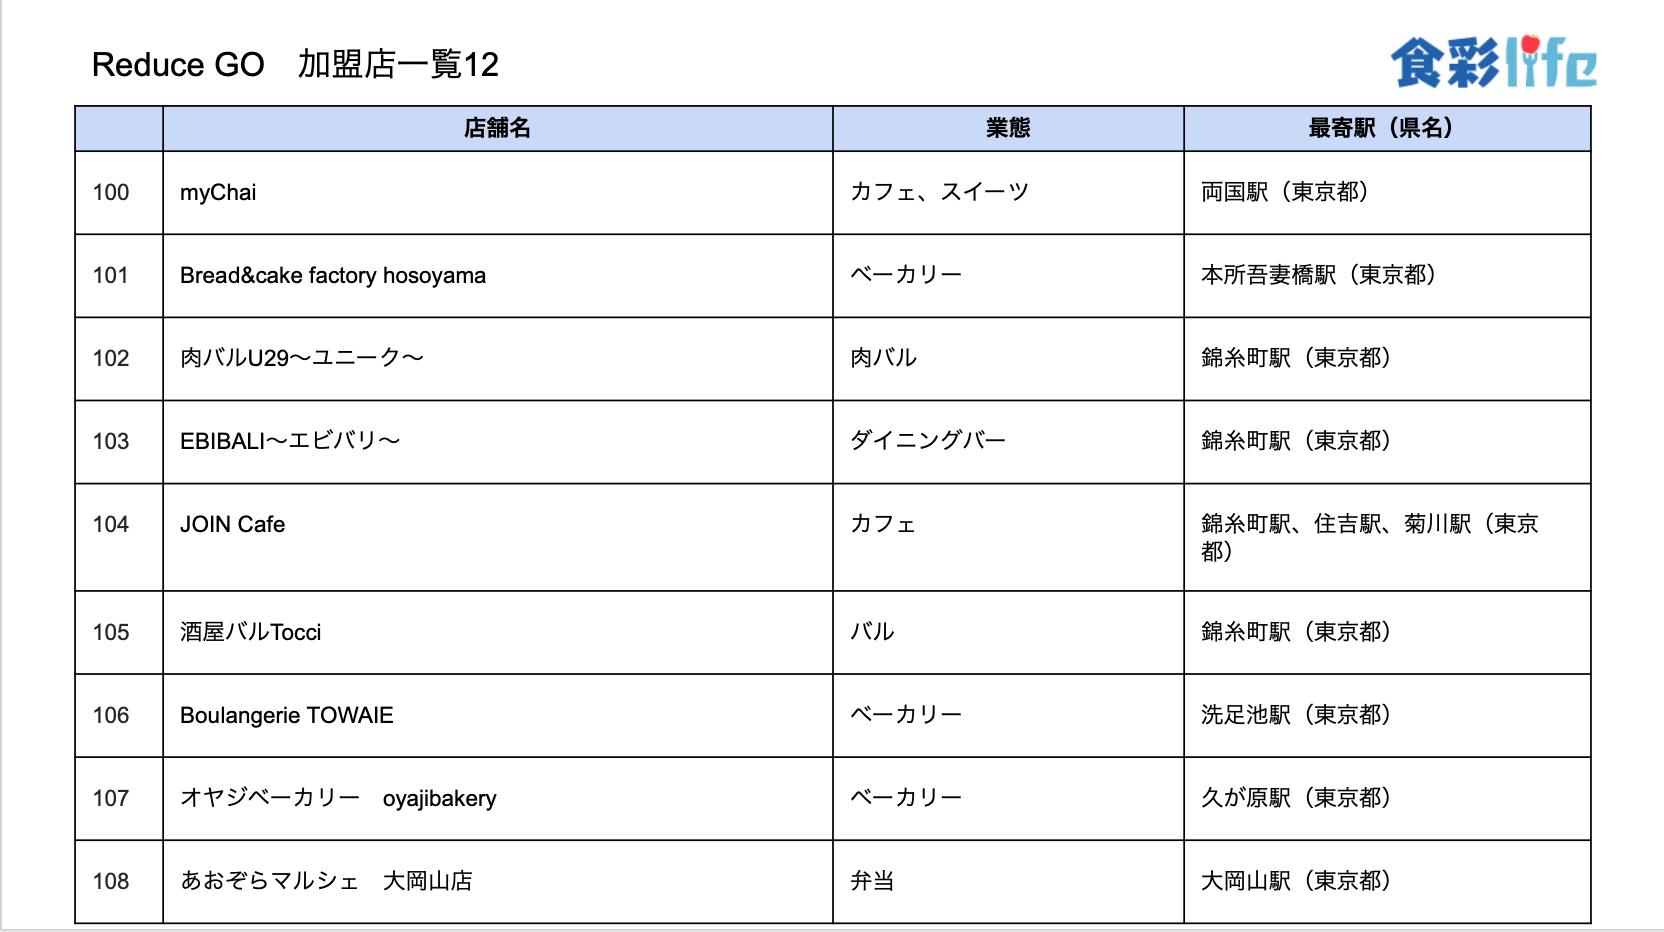 「ReduceGo」加盟店一覧12 (2020.3.18)